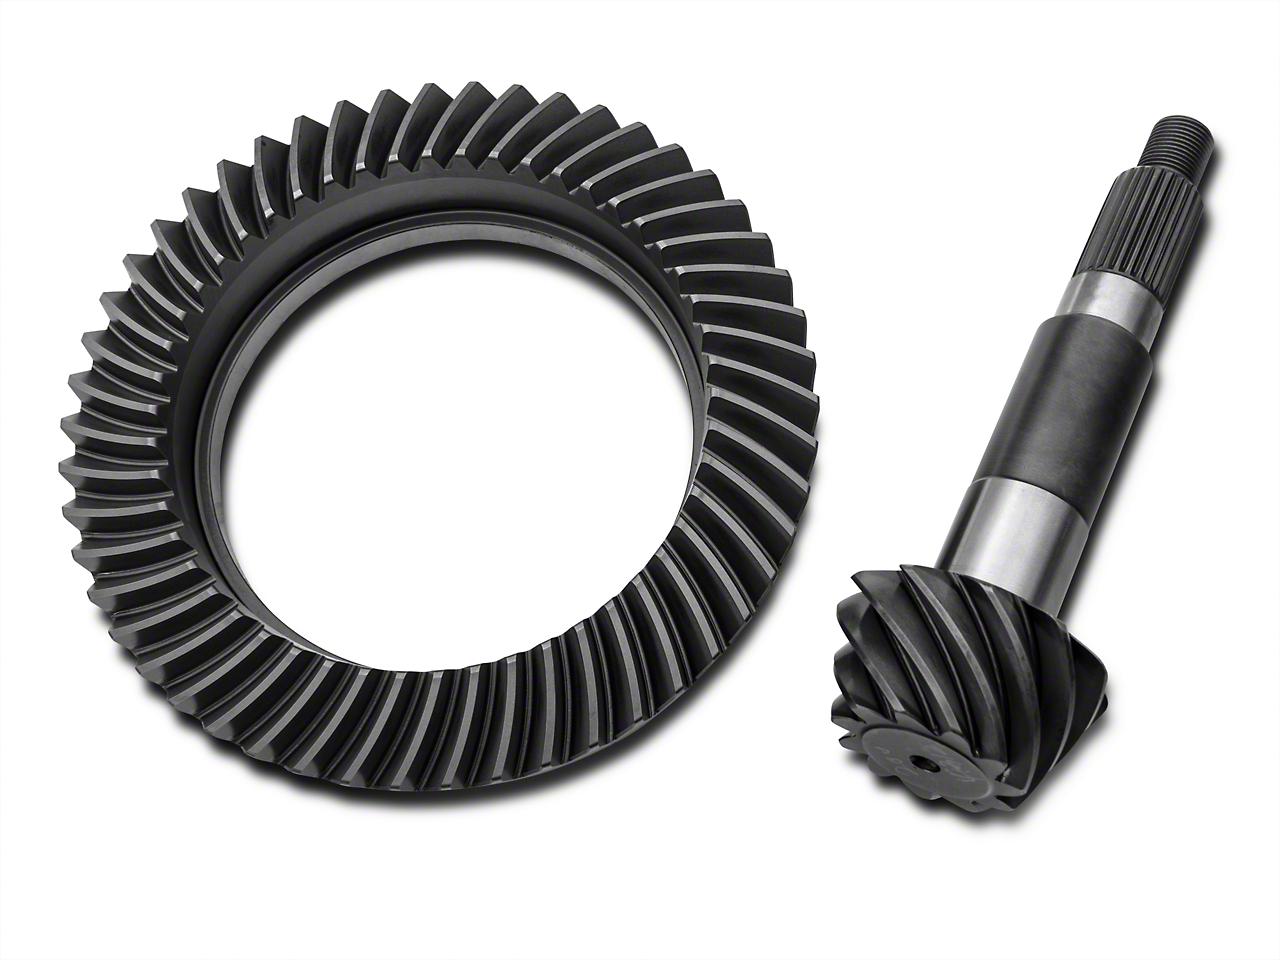 Yukon Gear Dana 44 Ring Gear and Pinion Kit - 4.56 Front, Rear (03-06 Wrangler TJ Rubicon)